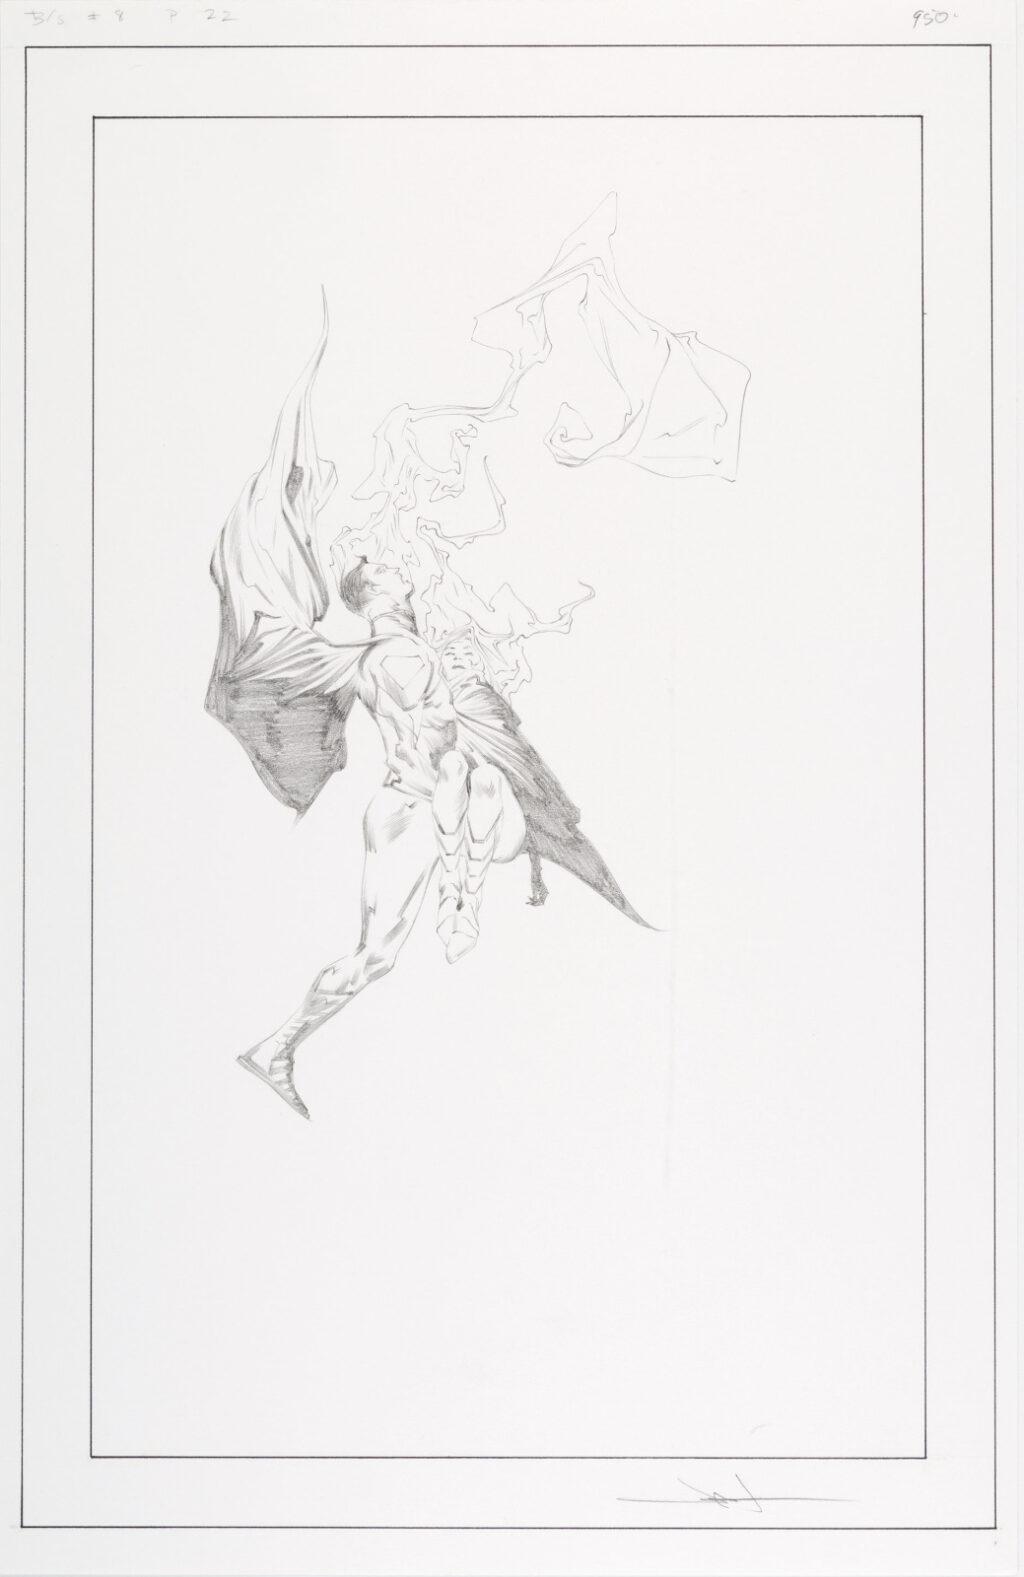 Batman Superman issue 8 page 22 by Jae Lee